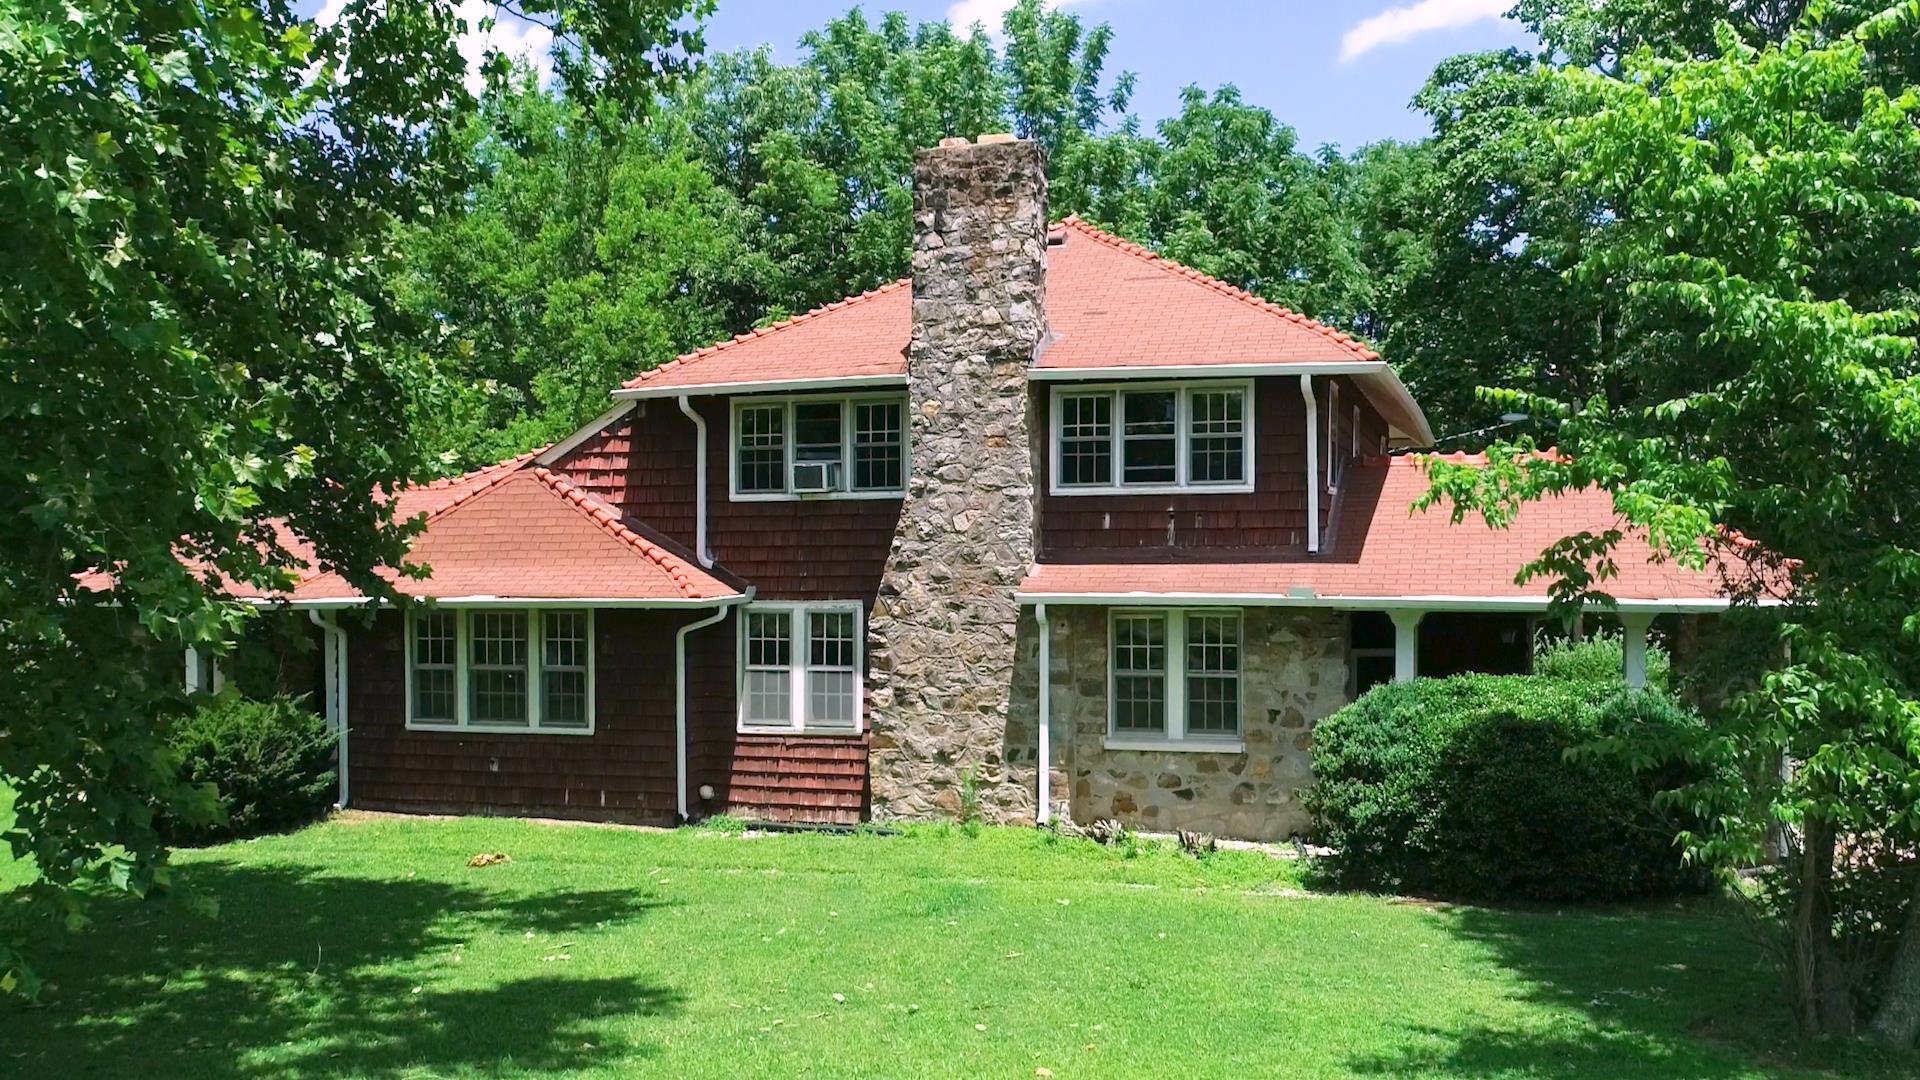 6728 Clarksville Hwy, Joelton, TN 37080 - Joelton, TN real estate listing